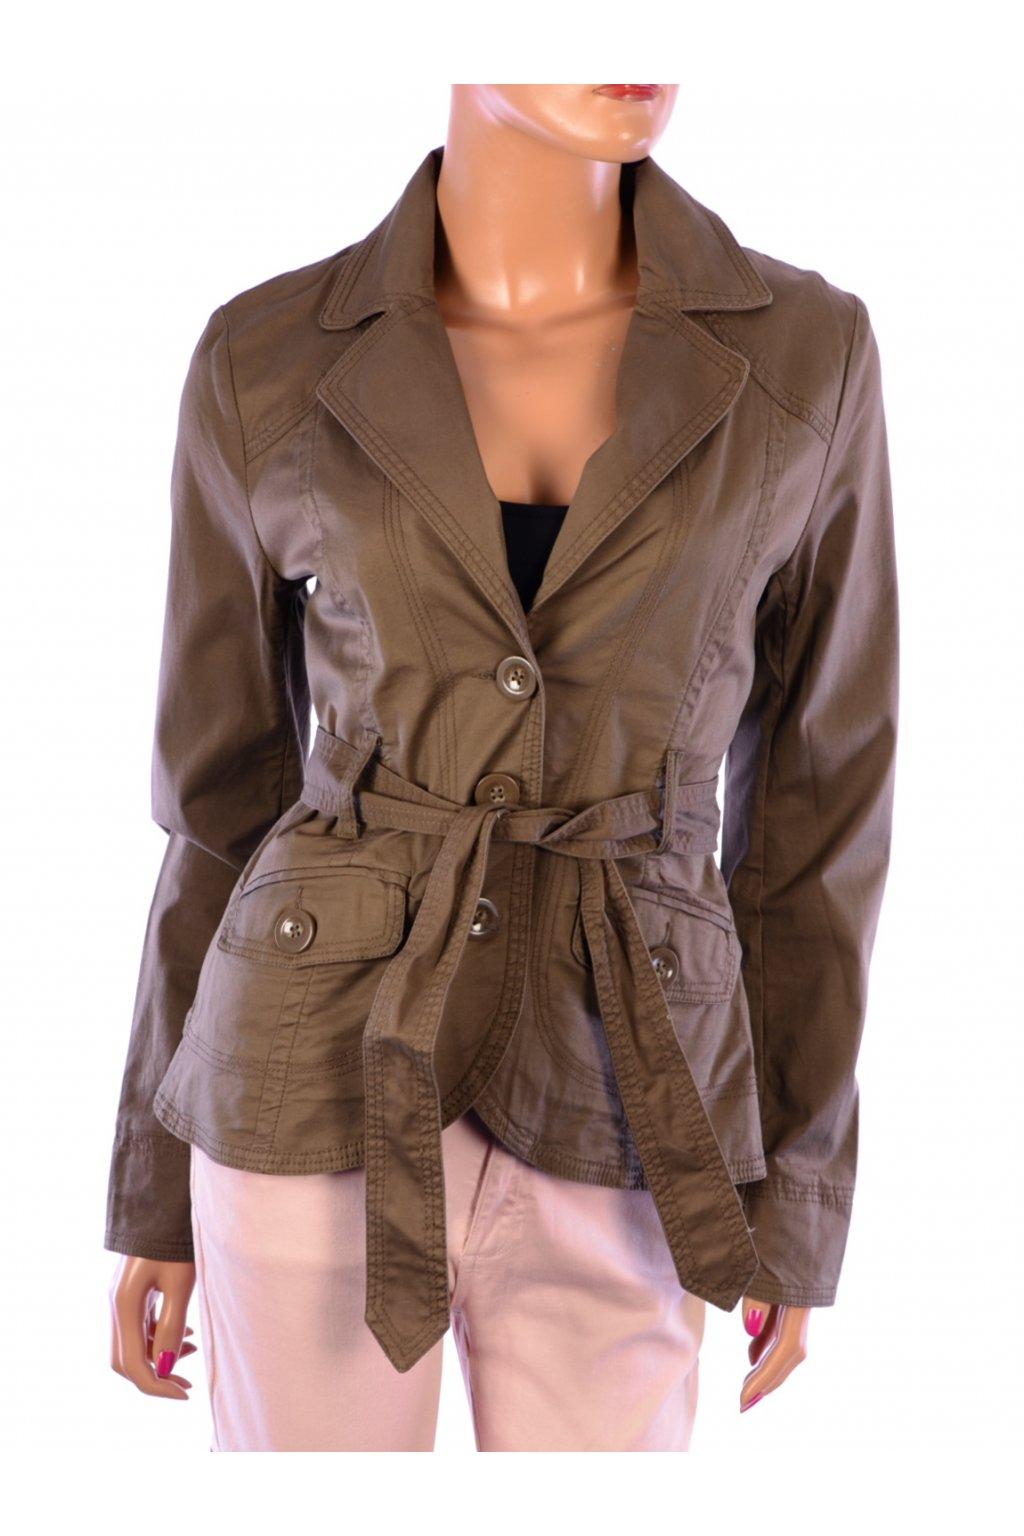 Kabátek sako hnědé H&M vel. 38 / uk 8 / S